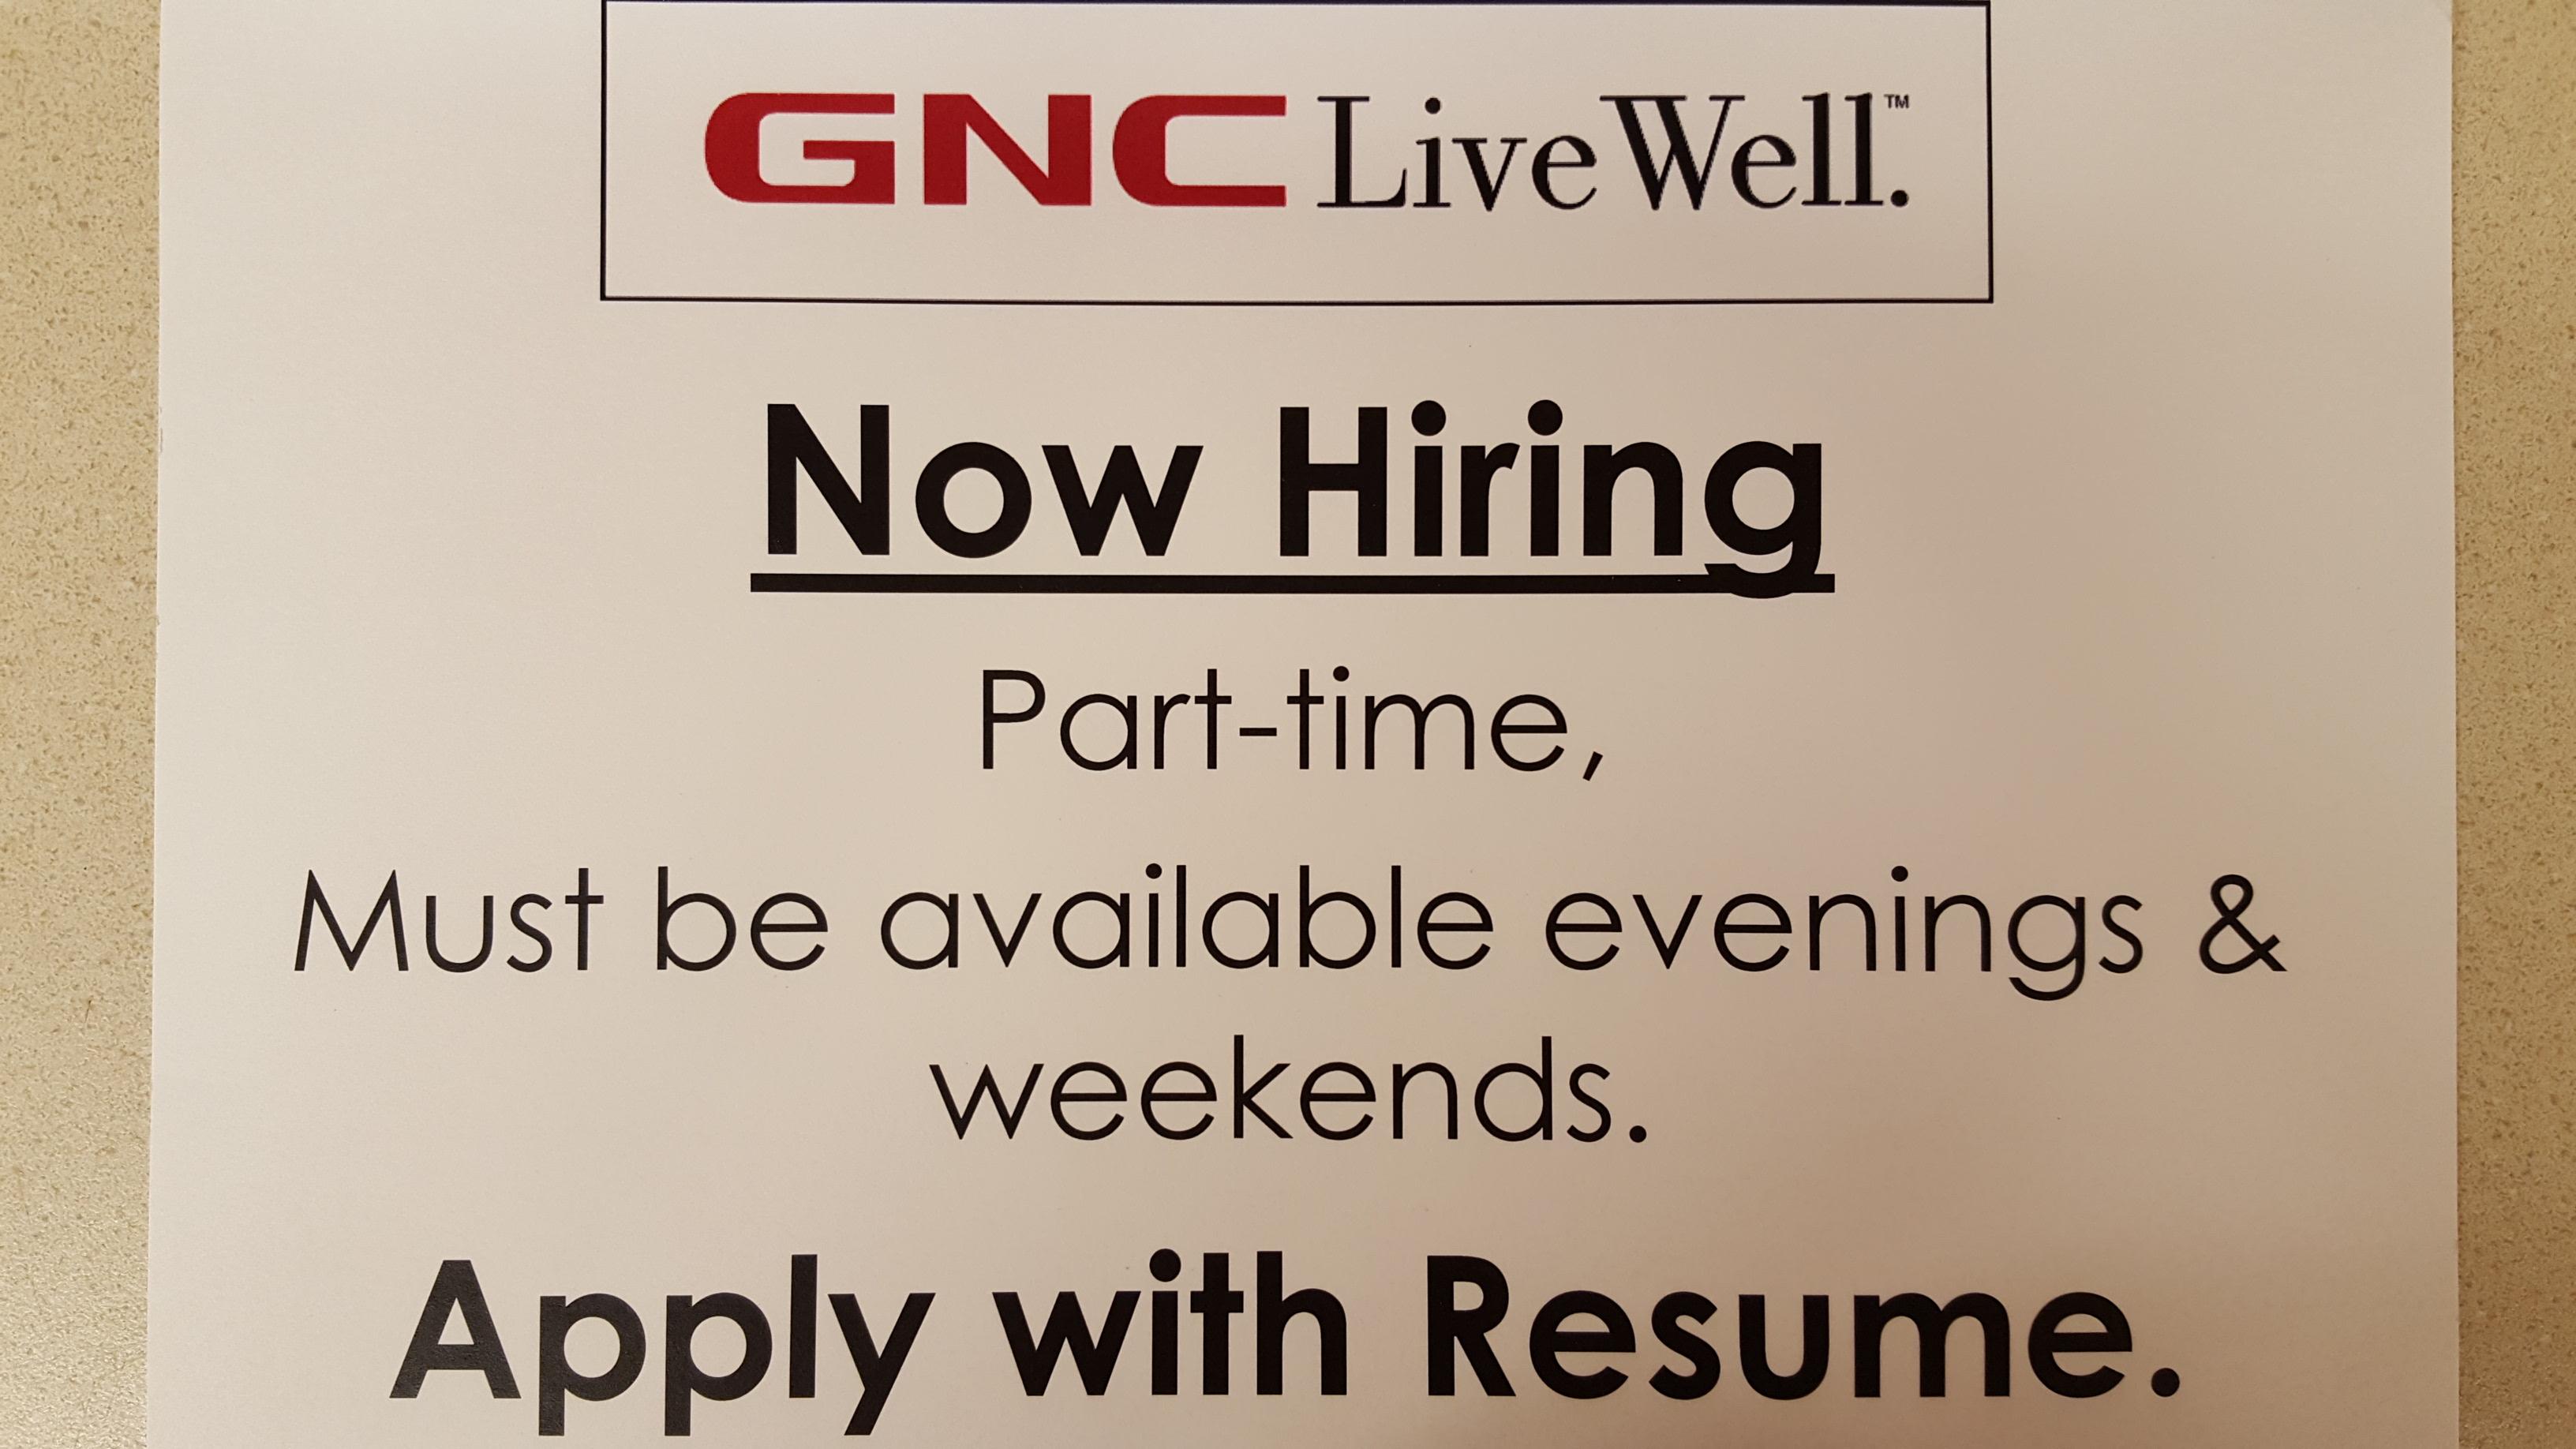 GNC now hiring information flyer